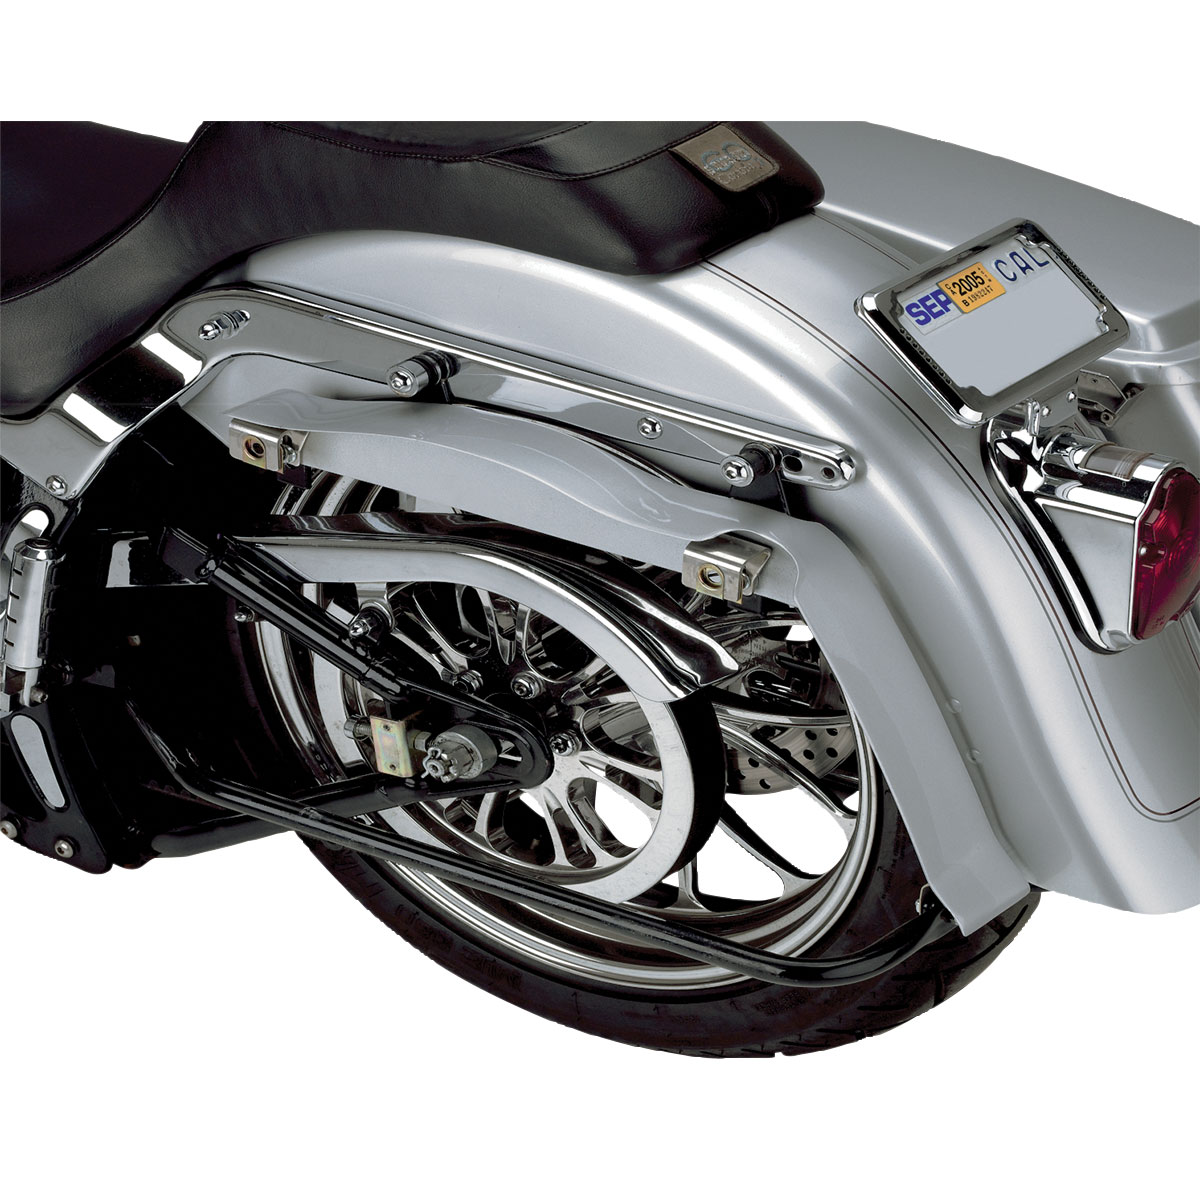 CycleVisions Saddlebag Filler Panels Chrome